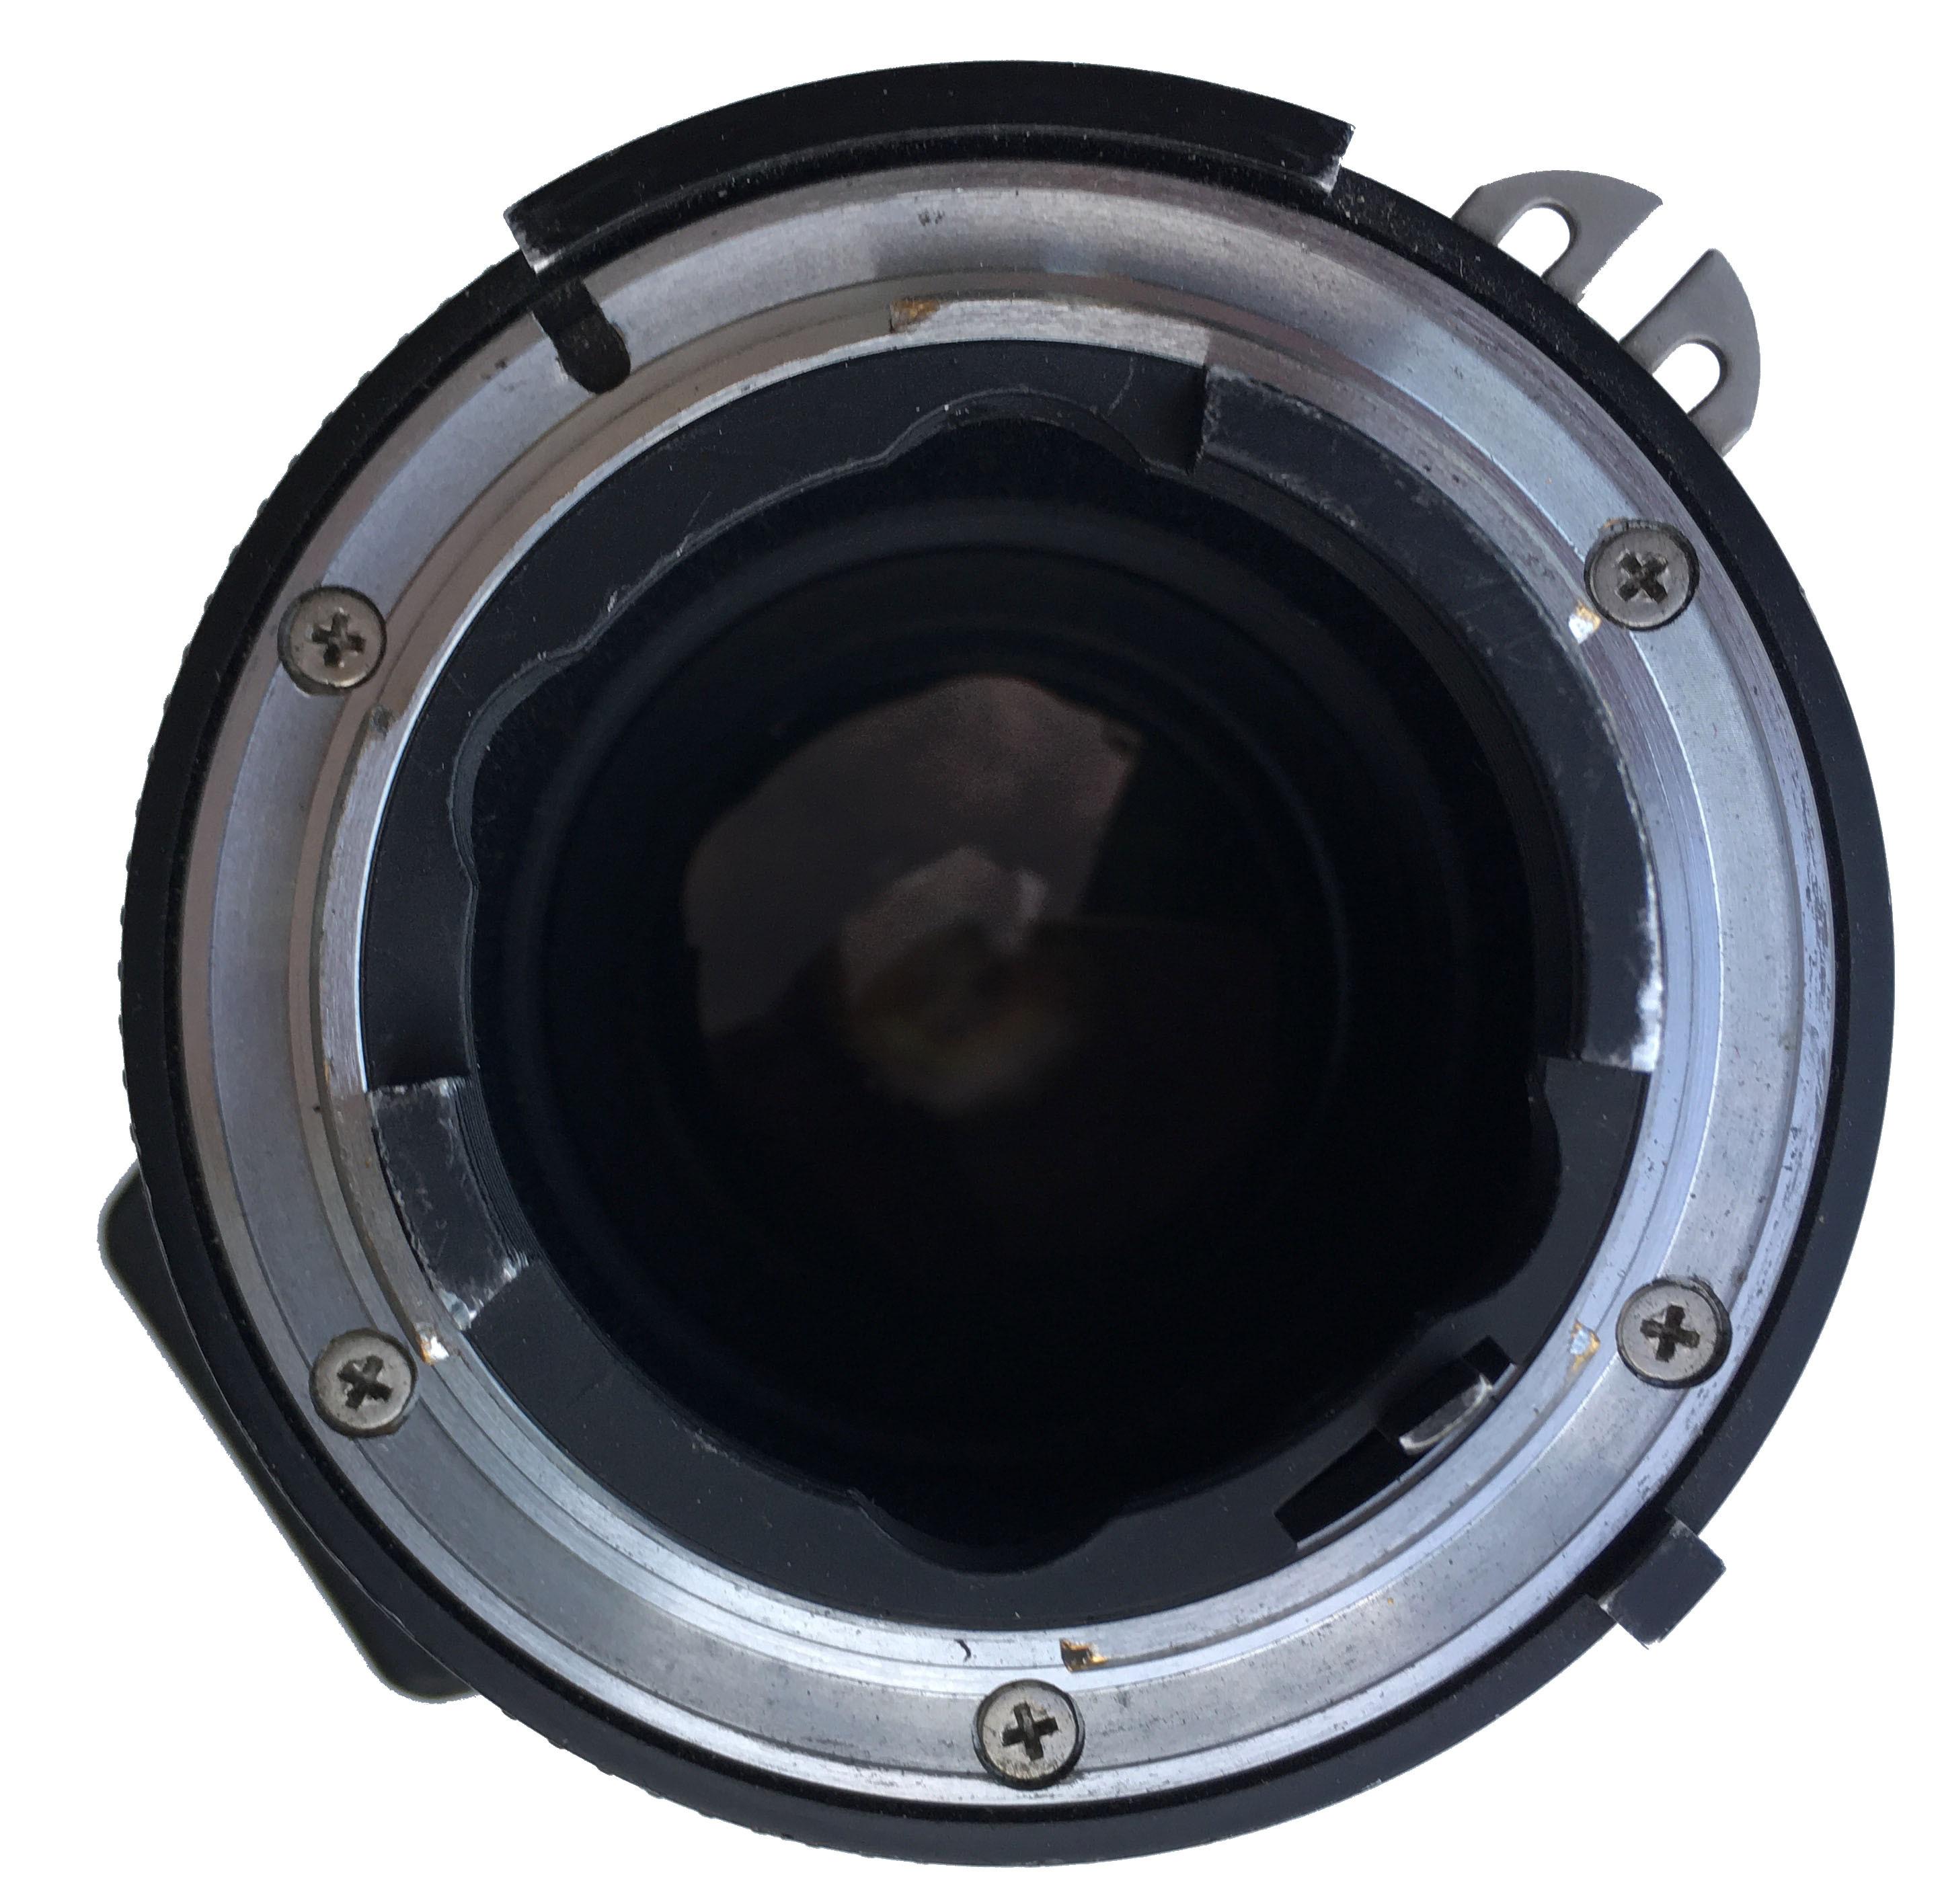 Nikon 300 mm f/2,8, baïonnette